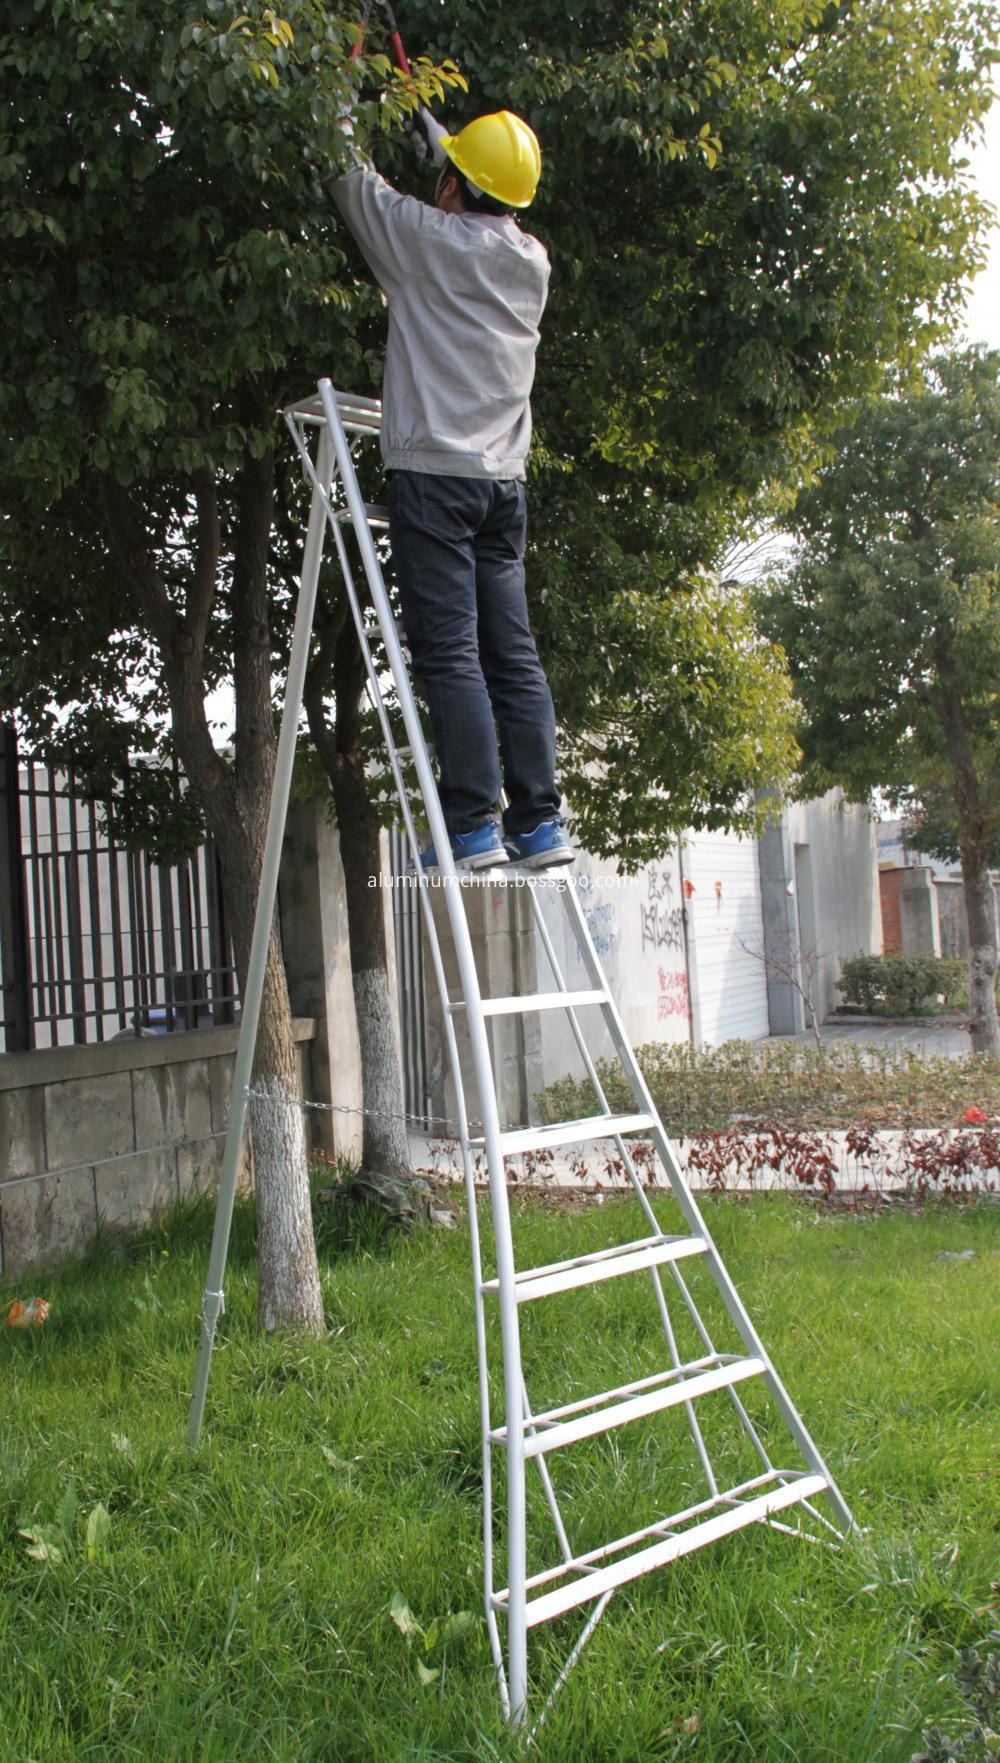 GMK_Tripod ladder